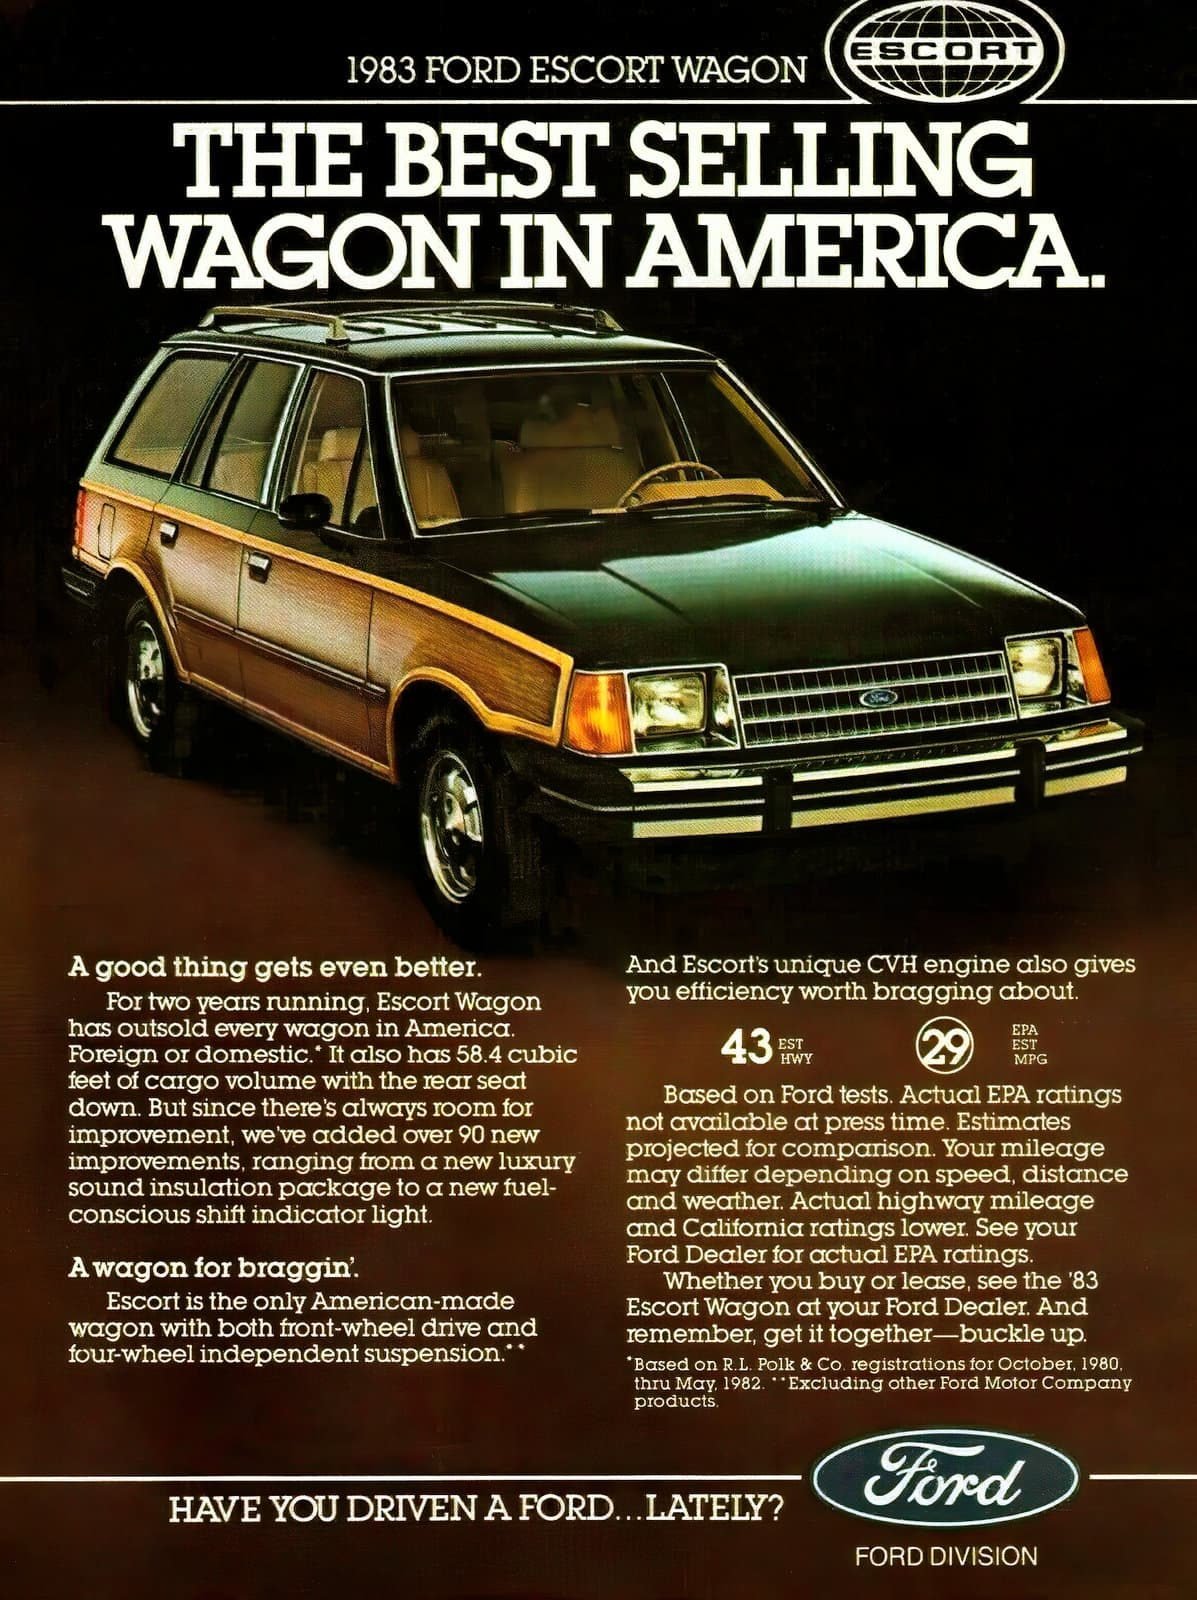 Vintage 1983 Ford Escort wagon